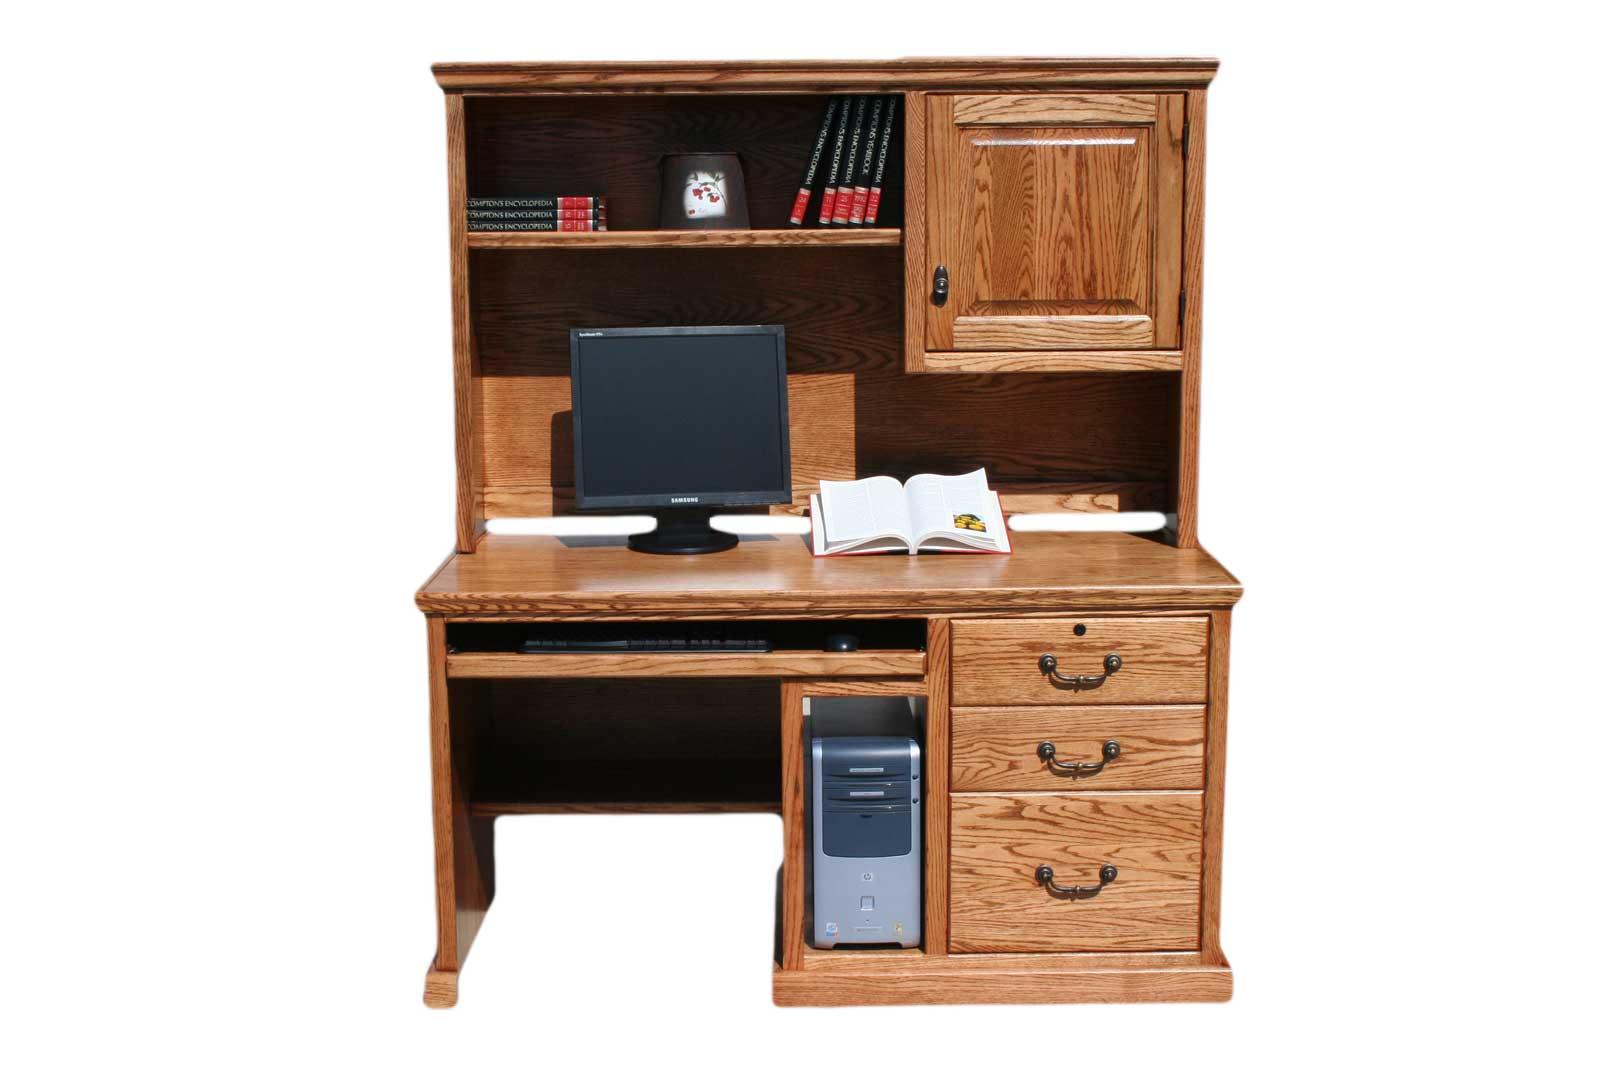 Person Computer Desk Home Office Home Desks. Second-sun.co